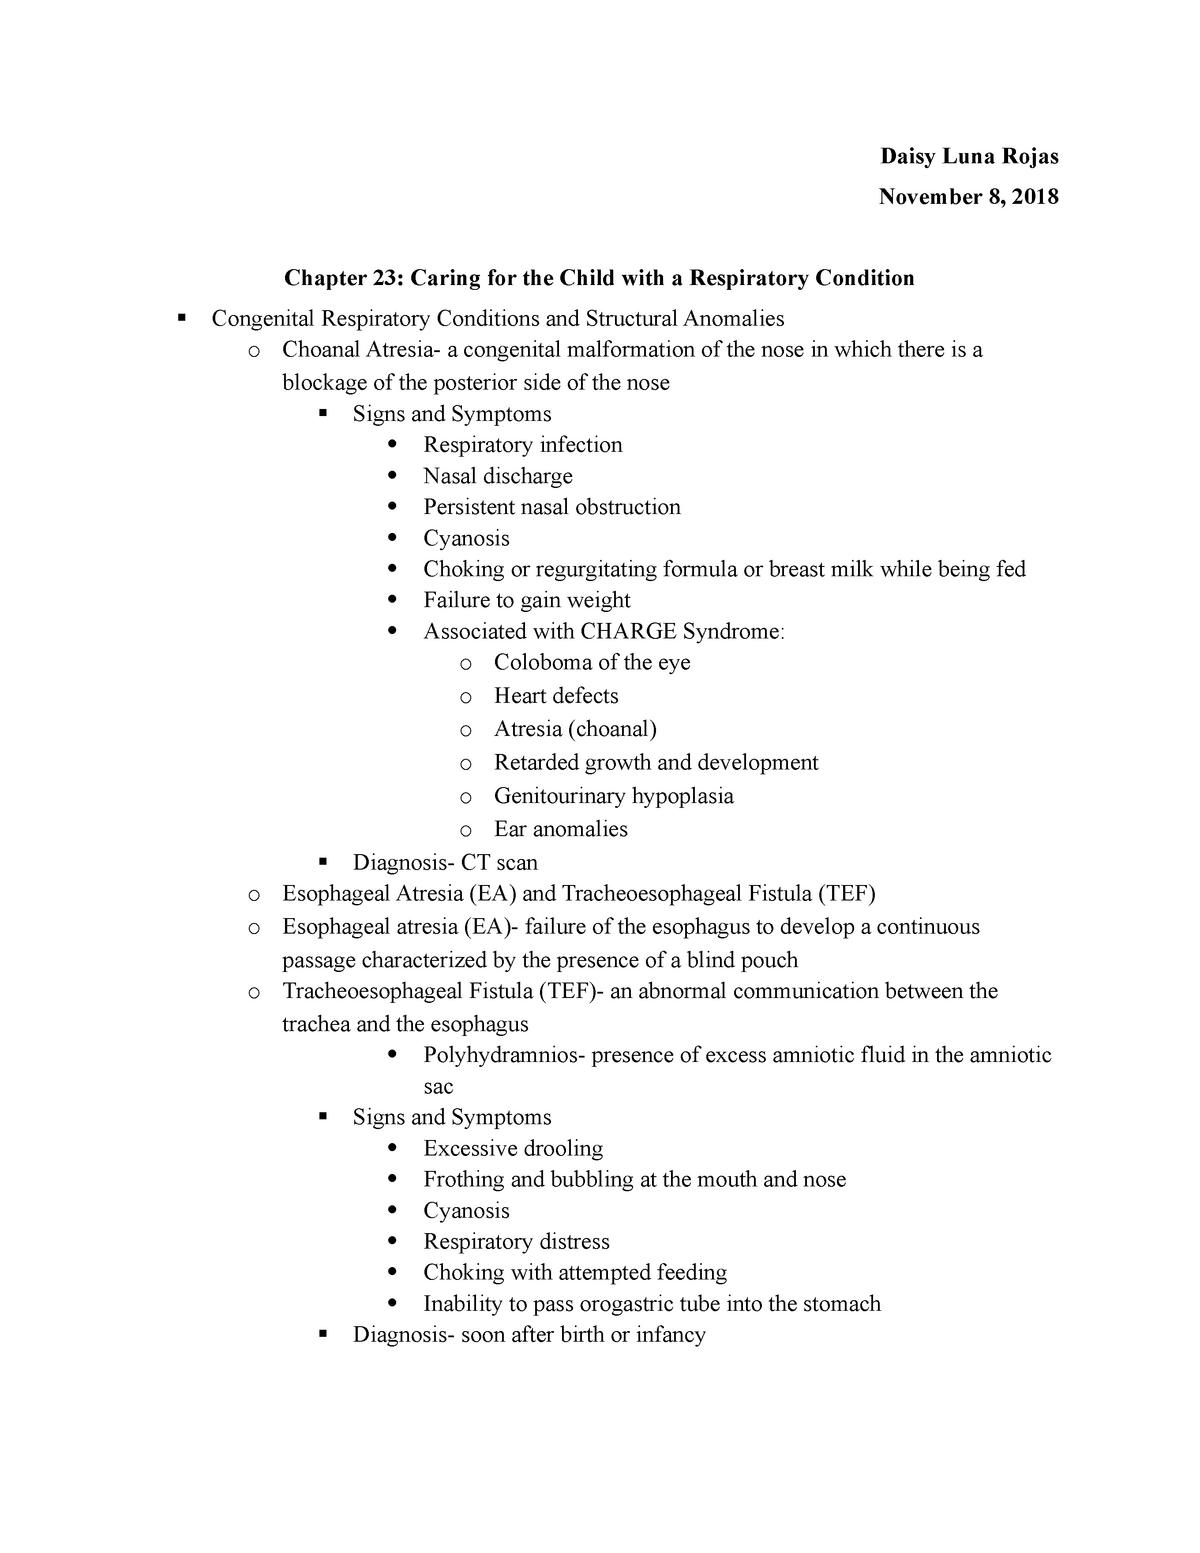 Chapter 23 - NSG 440: Pediatric Nursing - StuDocu